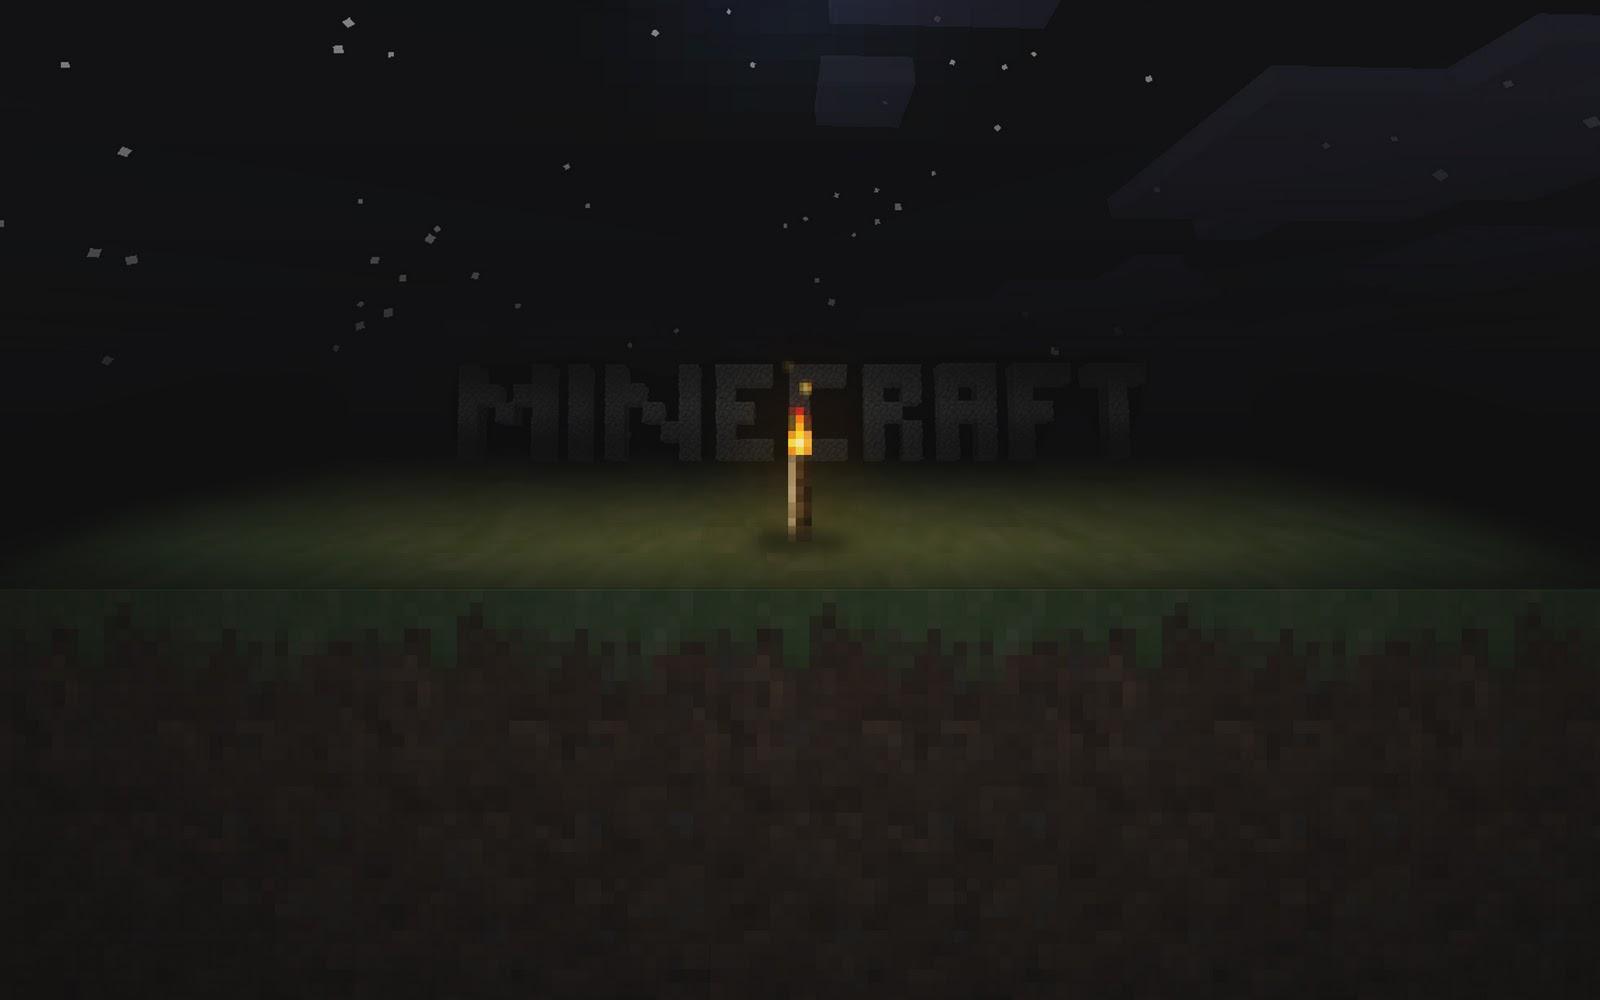 http://4.bp.blogspot.com/-NDR60UQbSe8/TqsItouITsI/AAAAAAAAAf4/oLdxJ4zTvUY/s1600/Minecraft+Wallpaper+HD+2560x1600.jpg